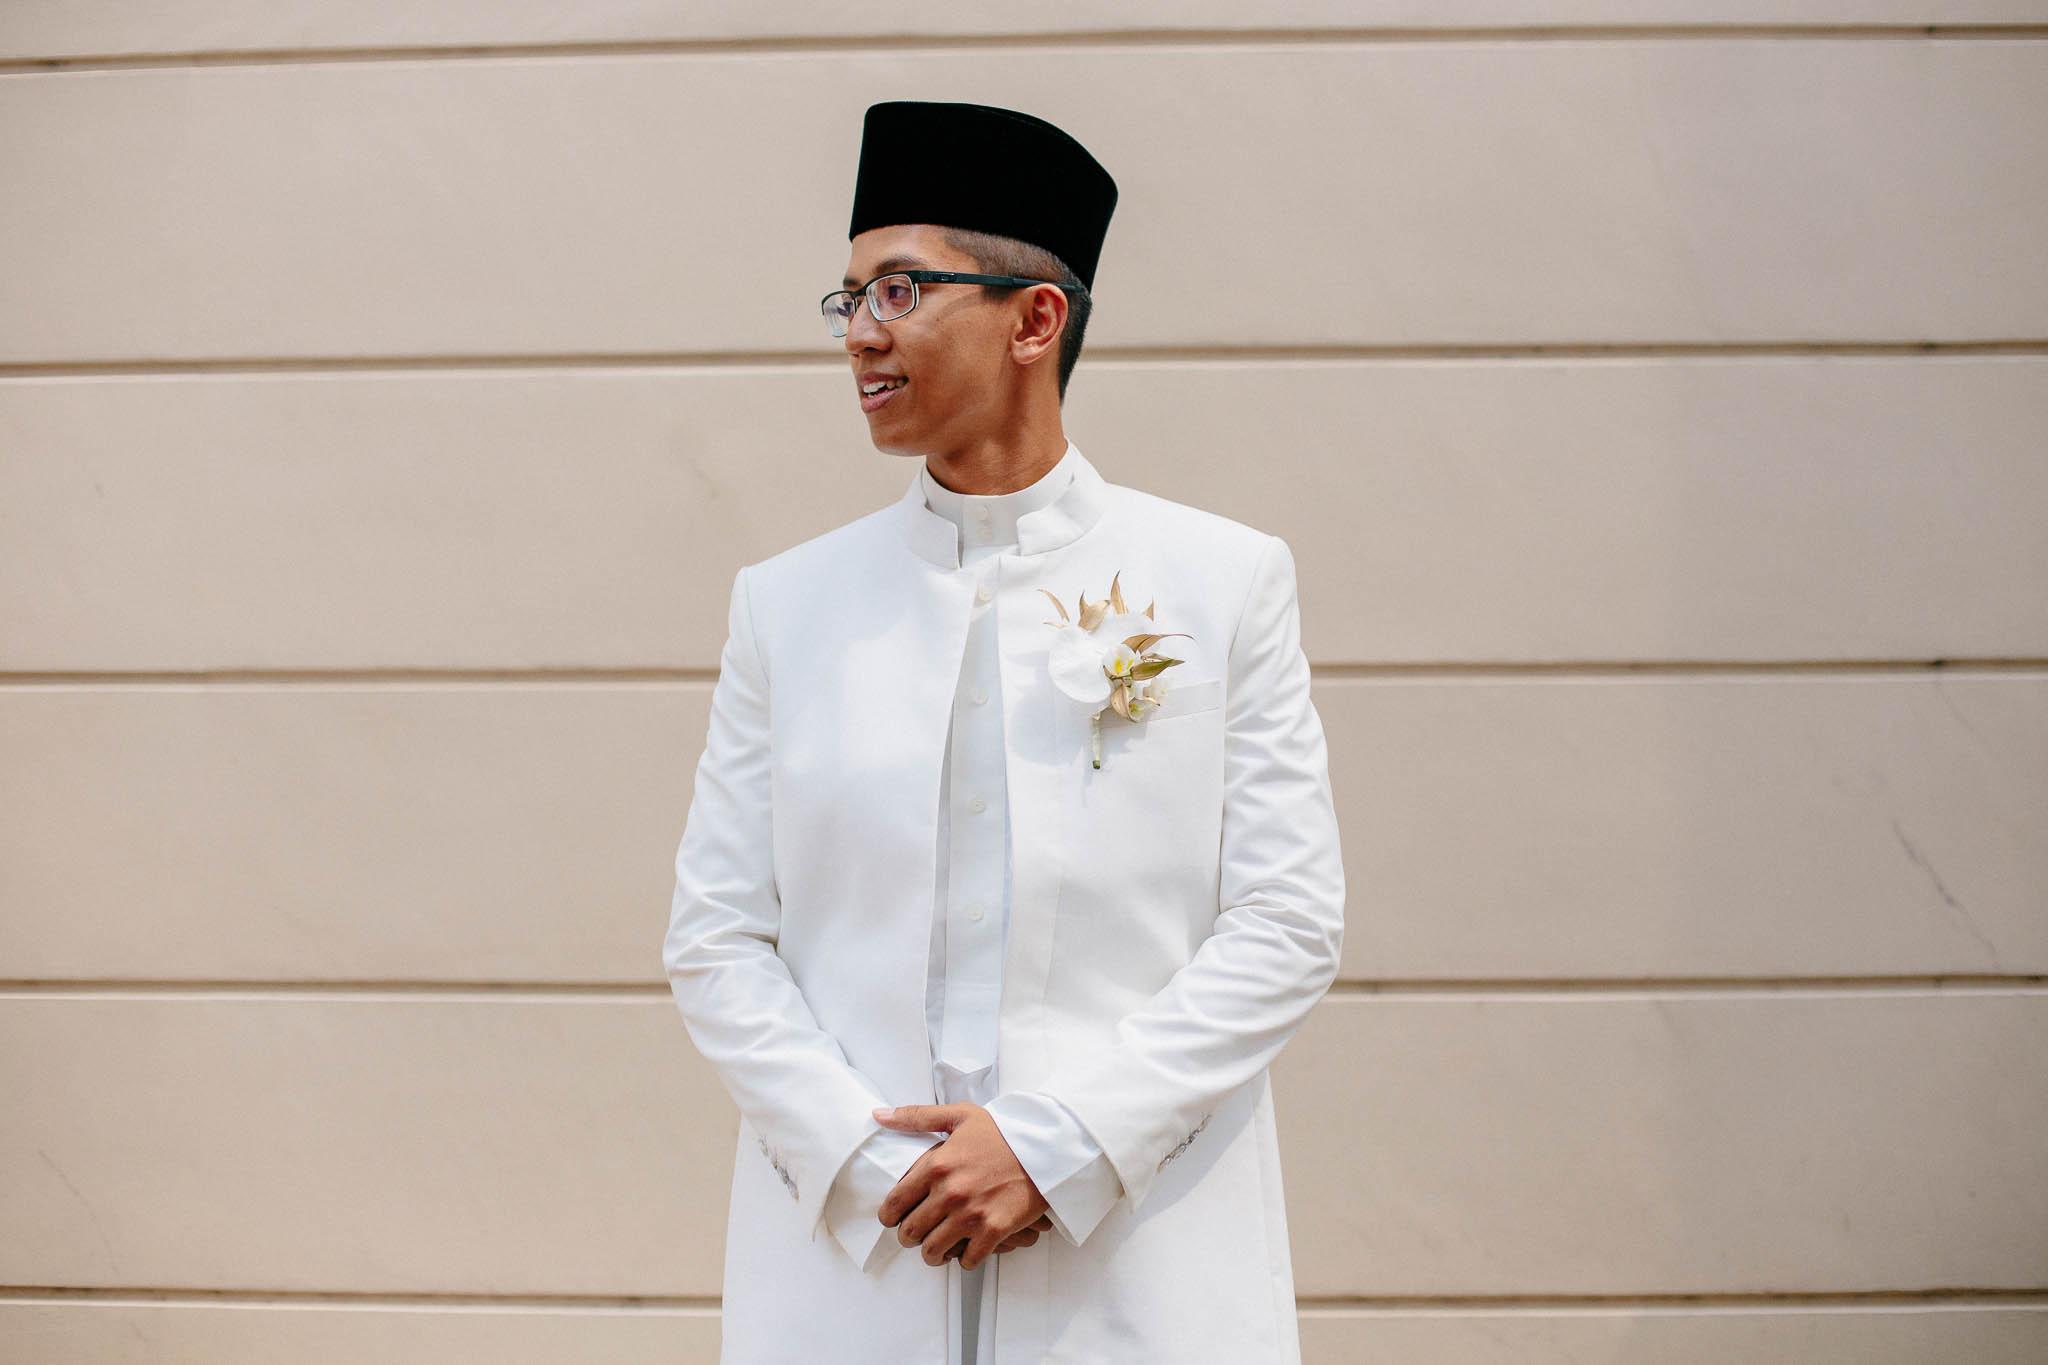 singapore-wedding-photographer-sharalyn-syazwan-011.jpg